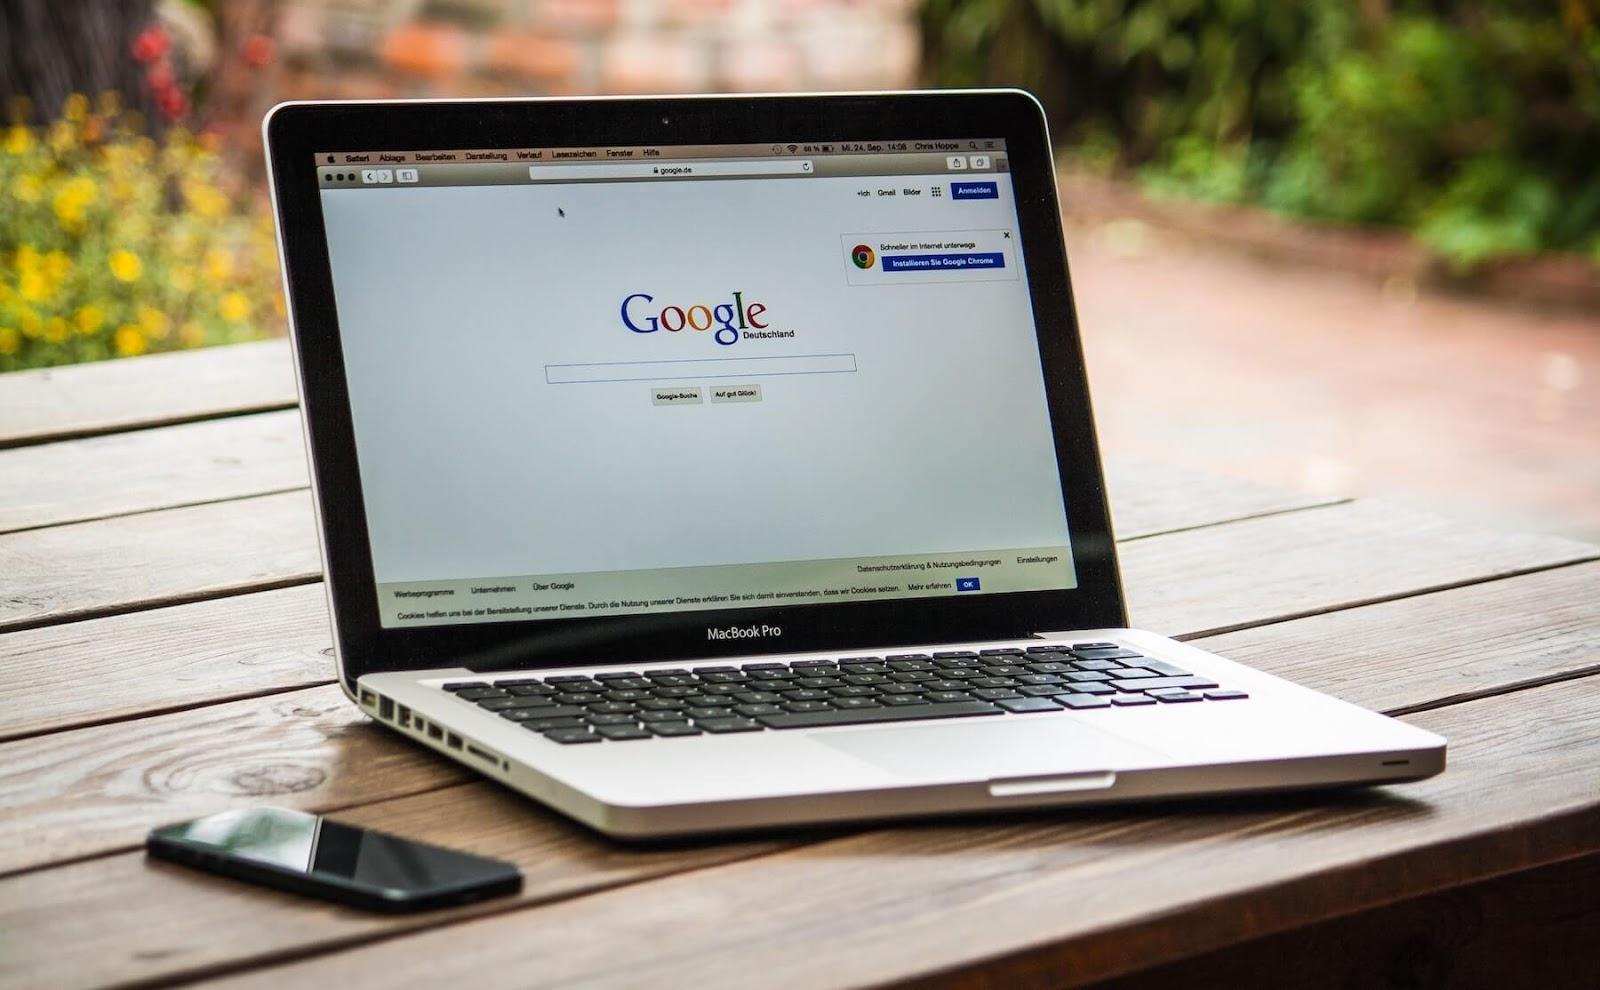 Google search on laptop